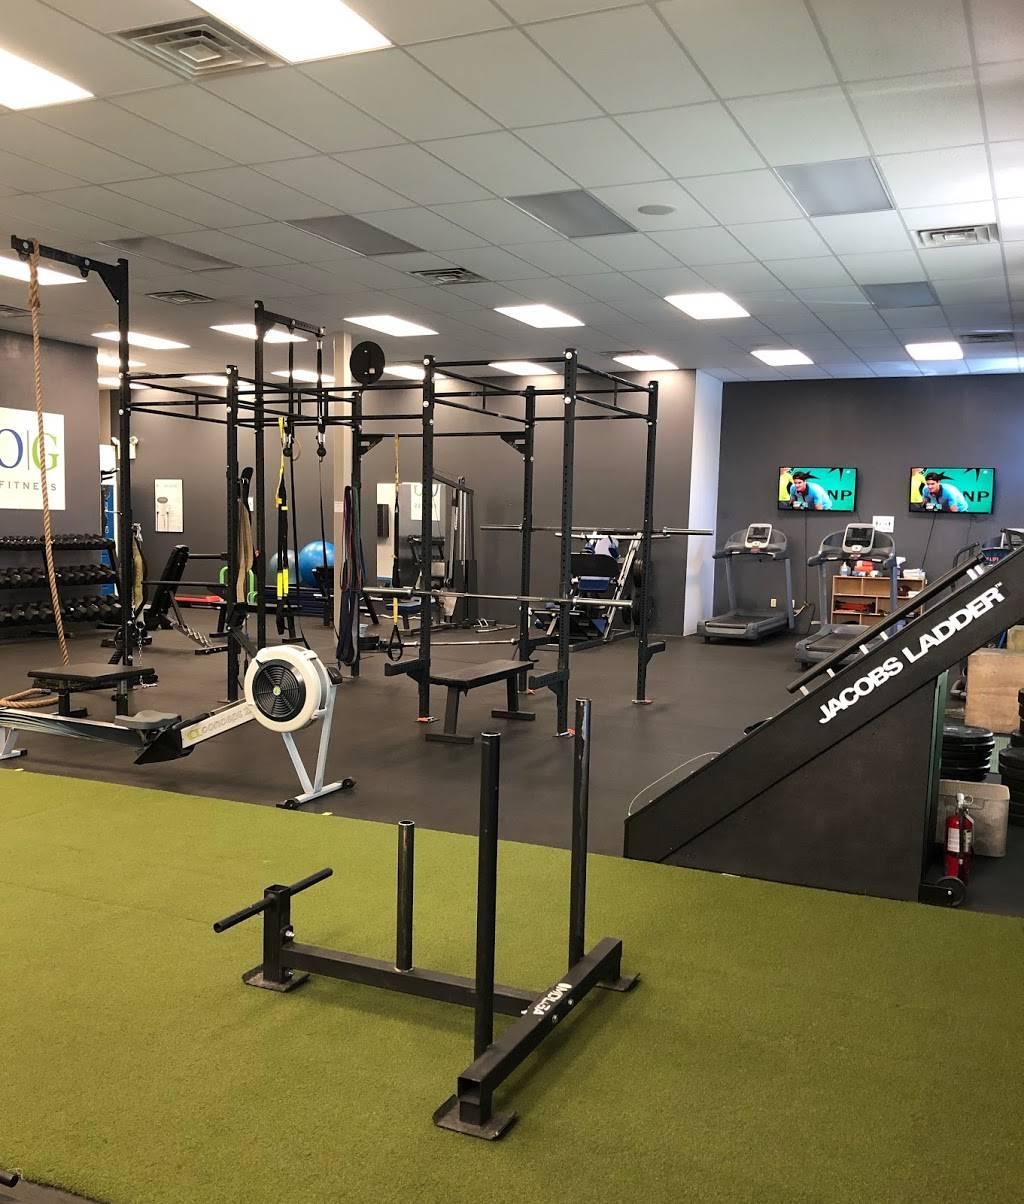 Open Gym Fitness - gym  | Photo 1 of 8 | Address: 10010 W Cheyenne Ave # 110, Las Vegas, NV 89129, USA | Phone: (702) 907-8907